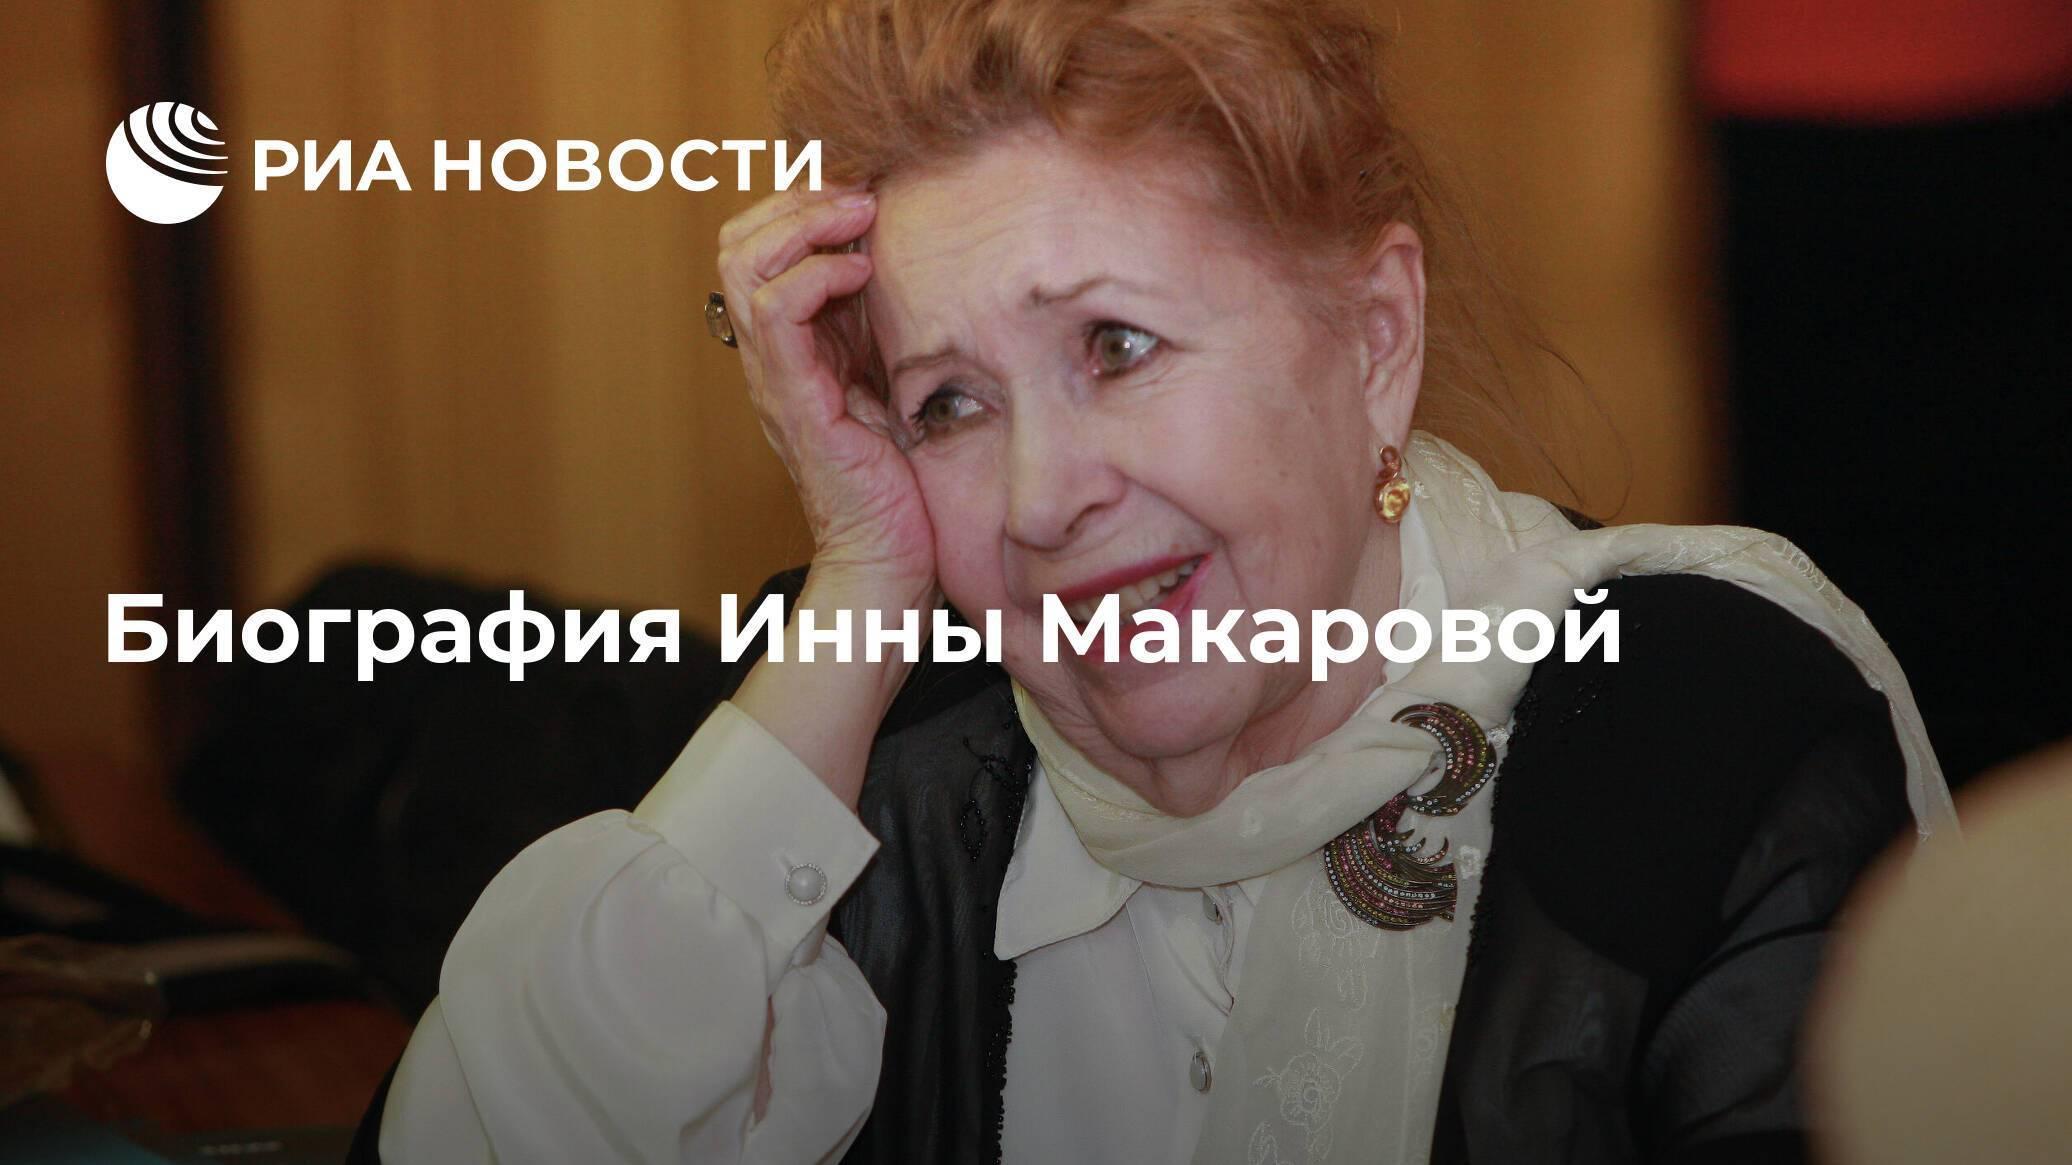 Макарова, инна владимировна